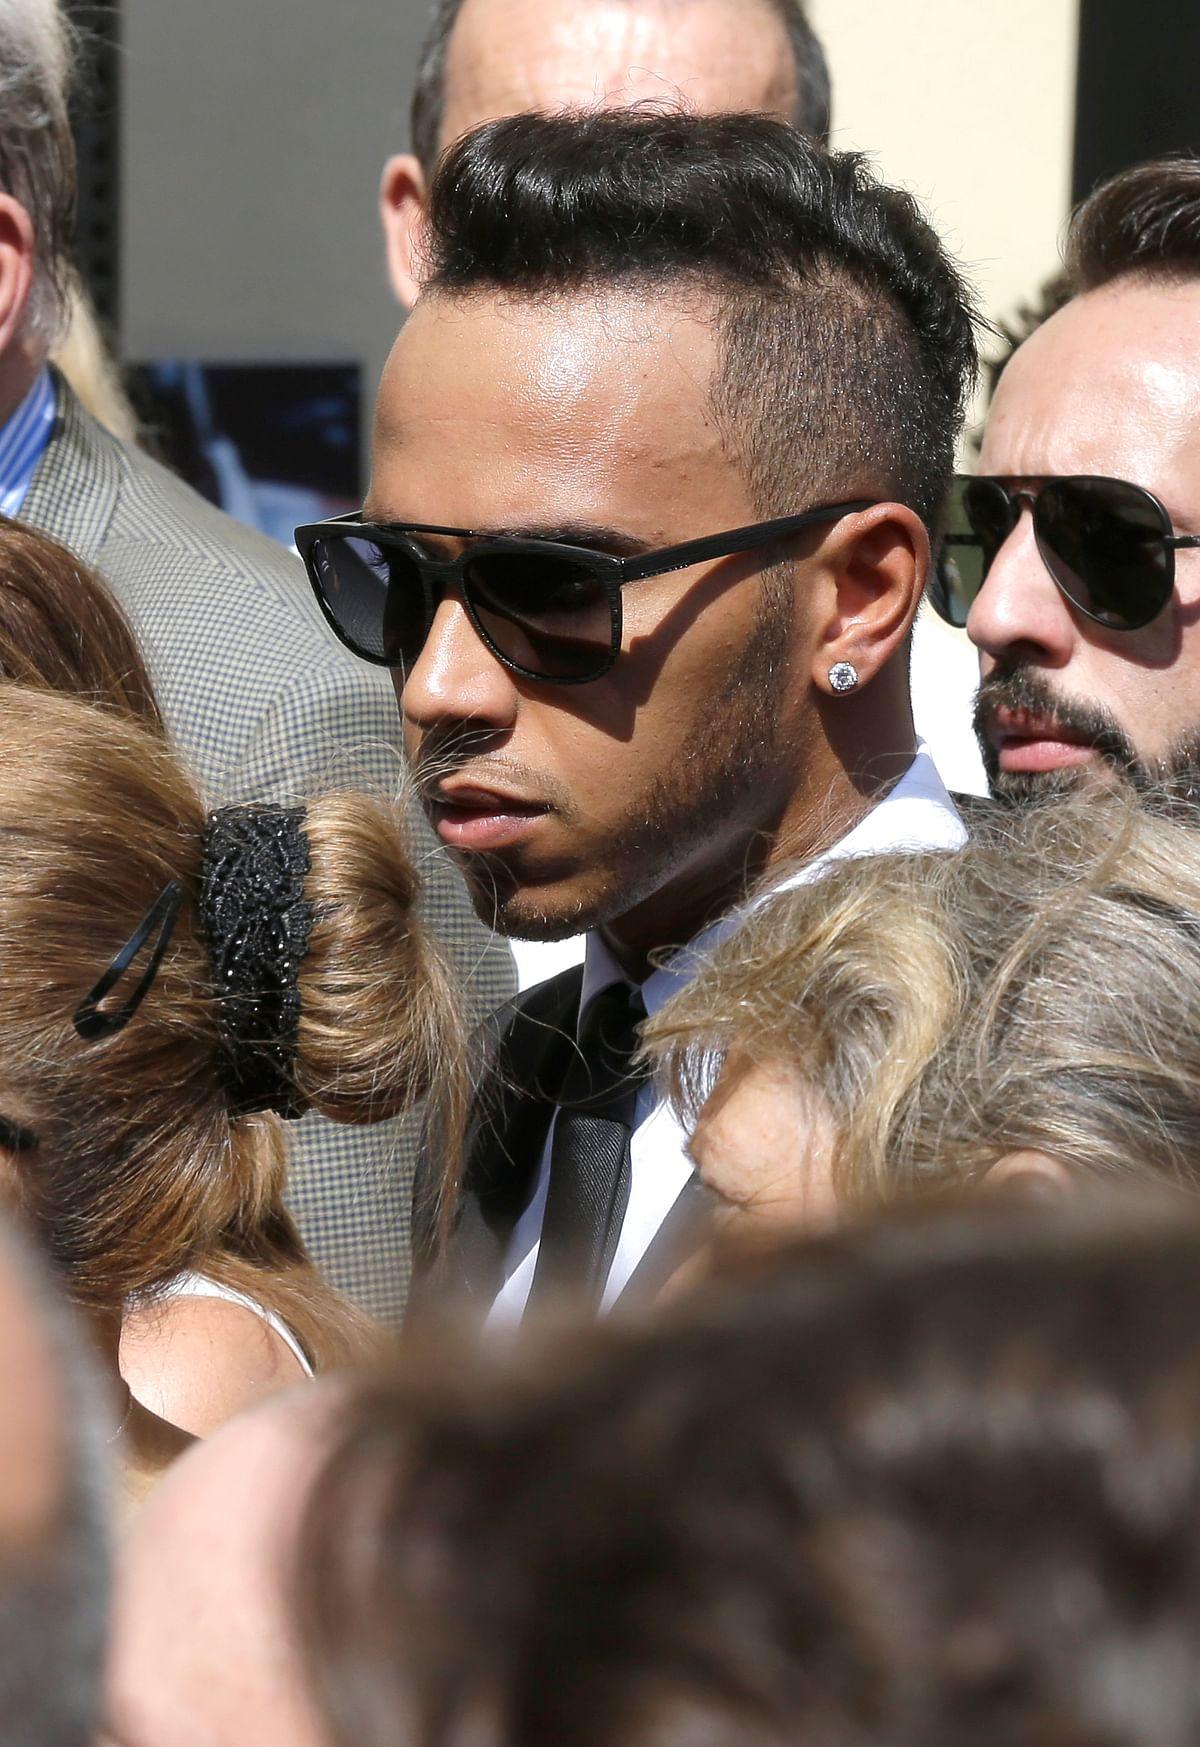 Reigning F1 Champion Lewis Hamilton at the ceremony. (Photo: AP)